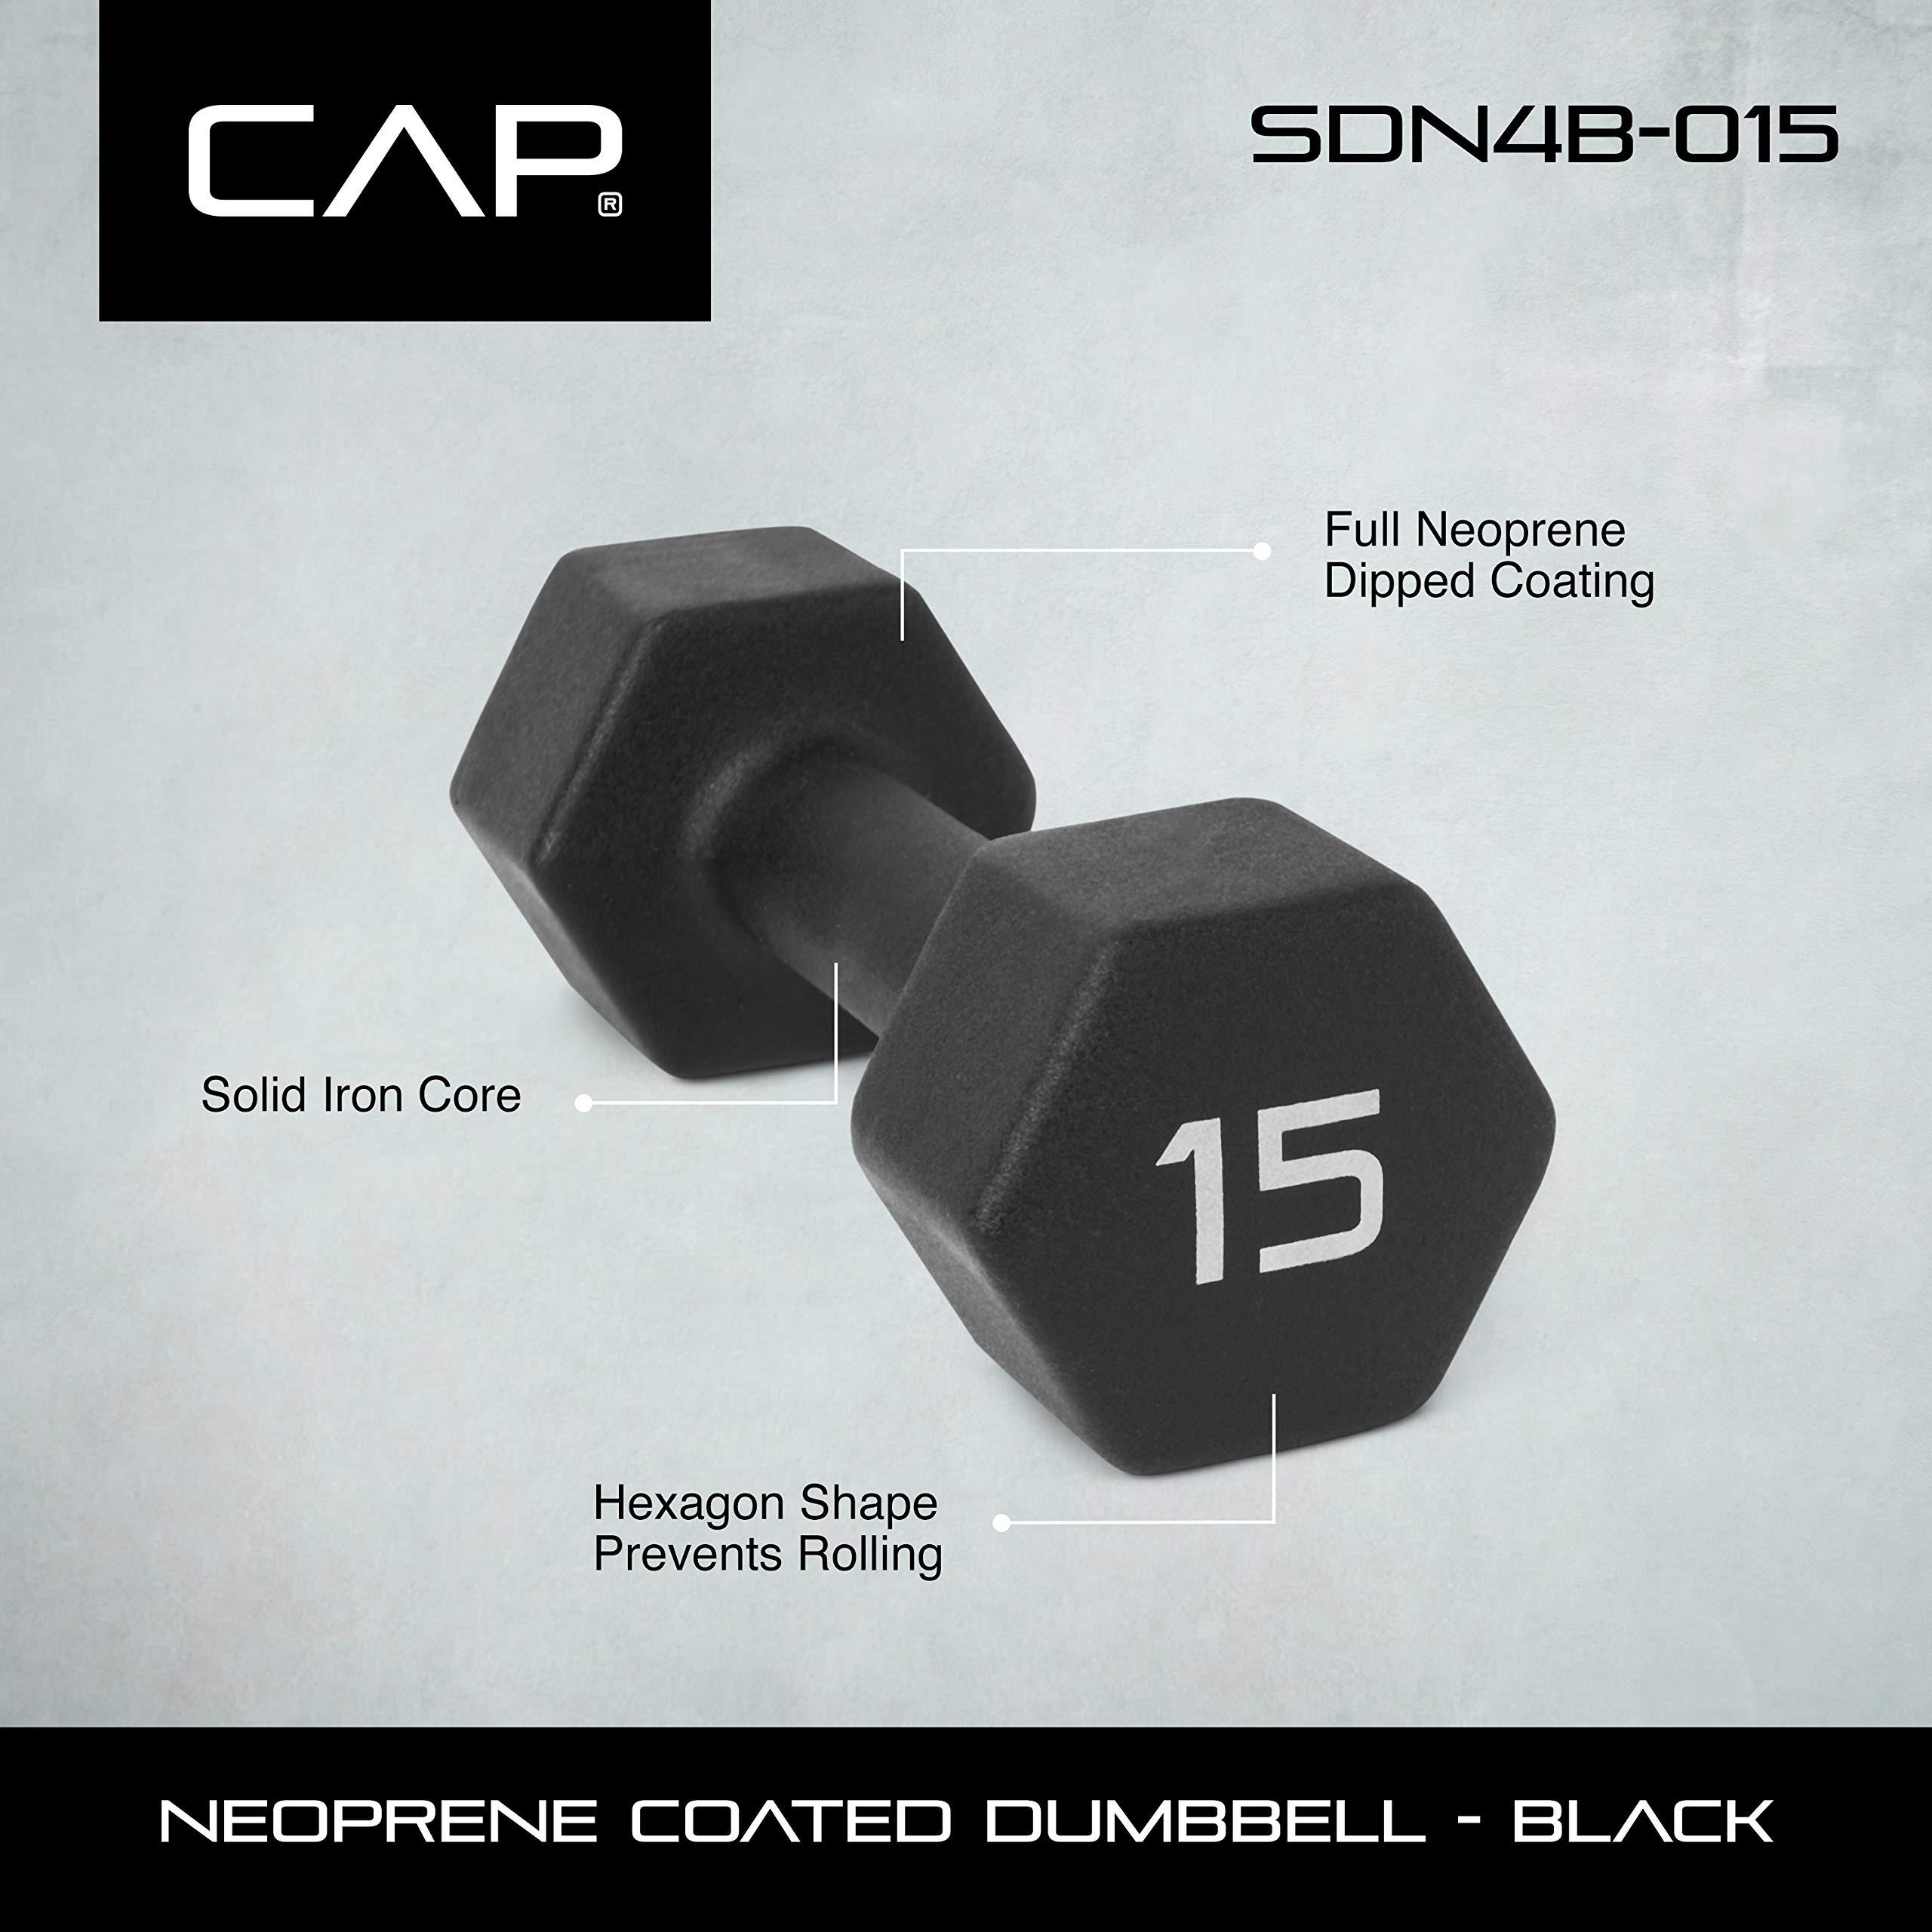 CAP Barbell Neoprene Coated Single Dumbbell, Black, 15-Pound by CAP Barbell (Image #2)